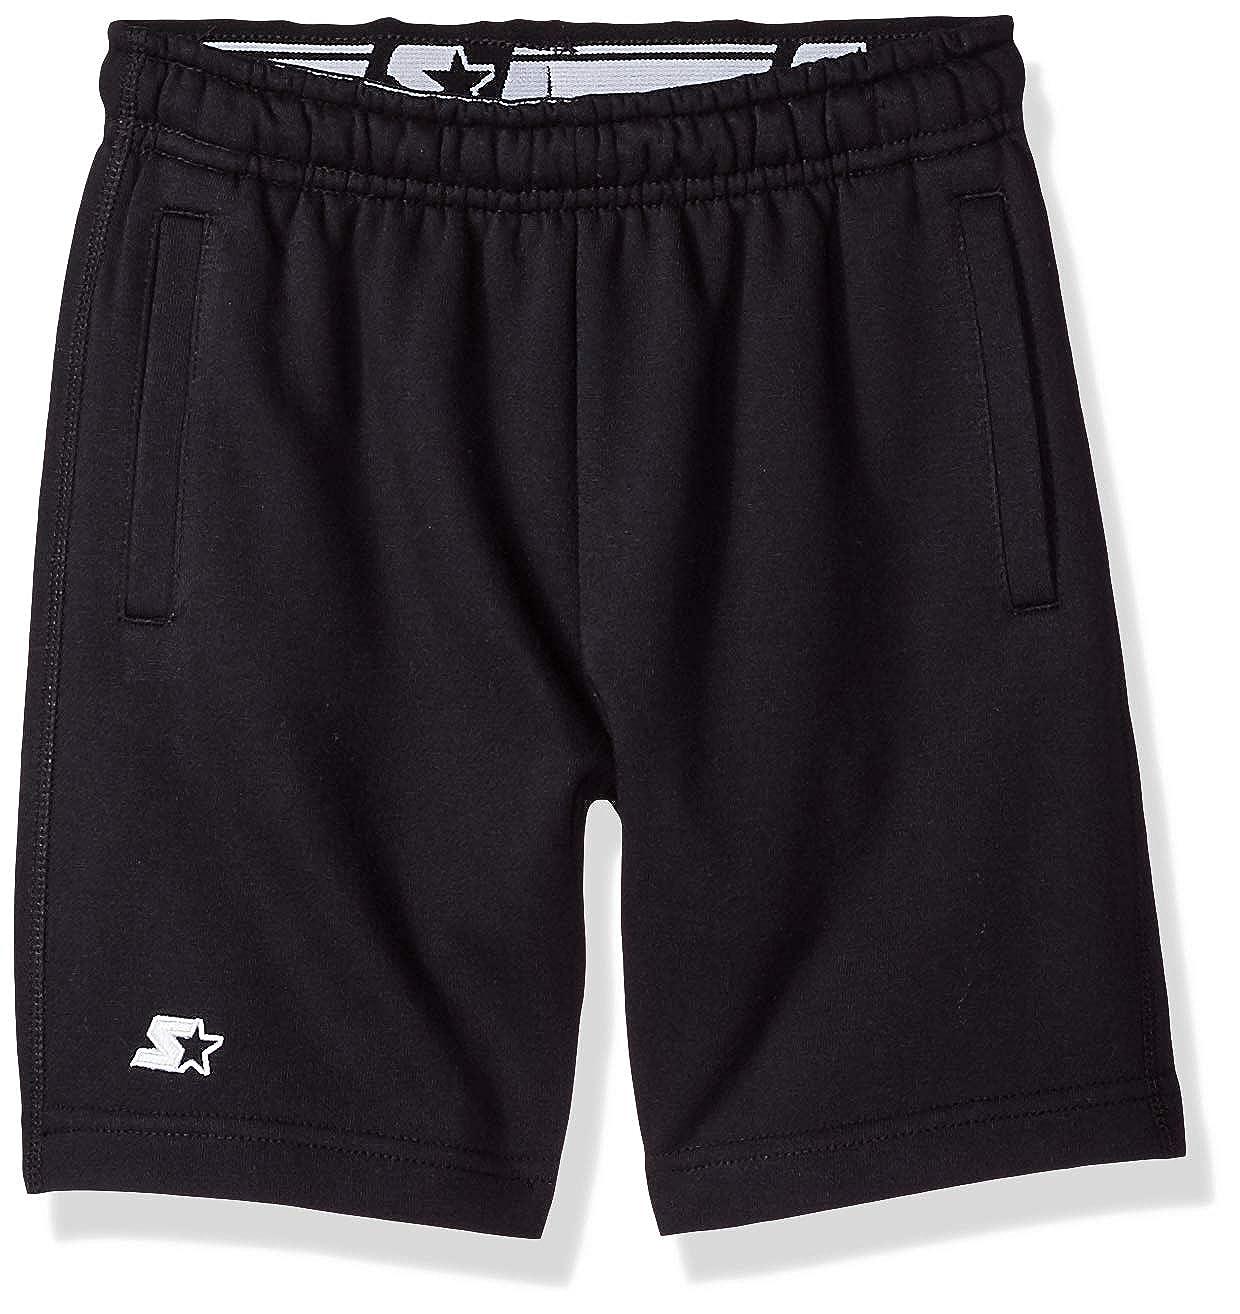 Exclusive Starter Girls 7 Lightweight Fleece Shorts with Pockets